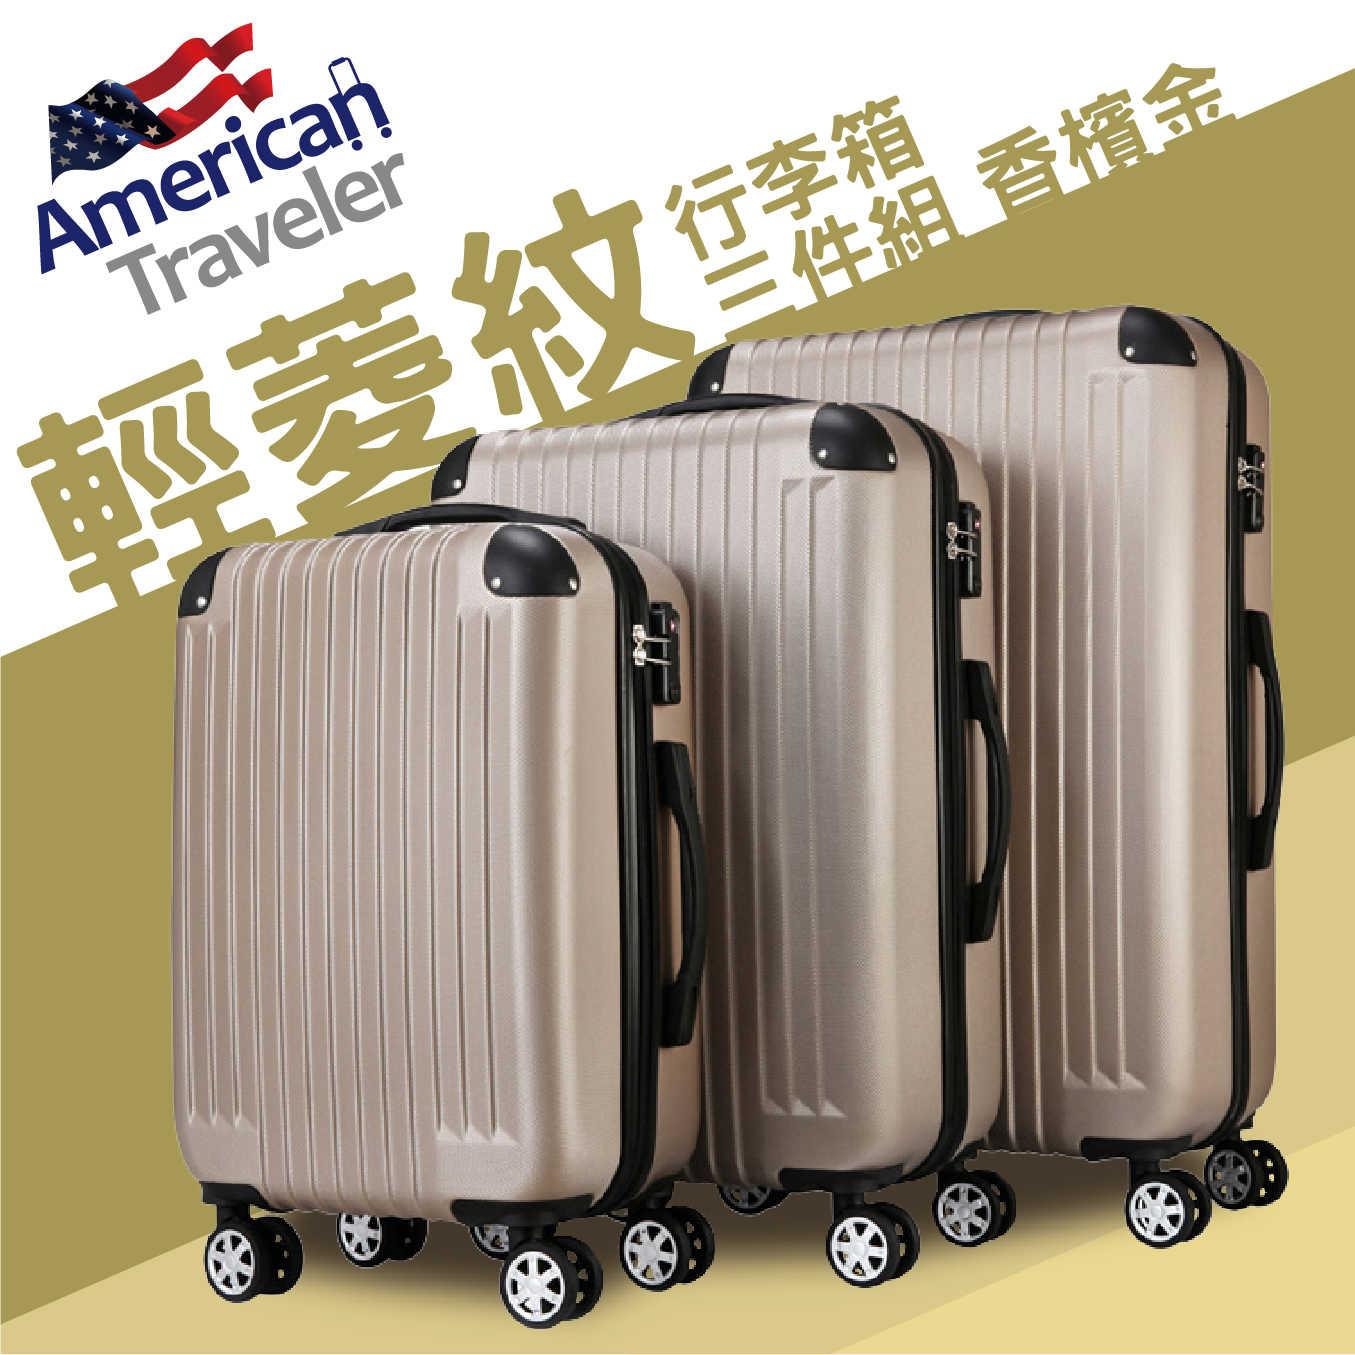 American Traveler ABS超輕量菱紋抗刮行李箱三件組 (20+25+29吋)